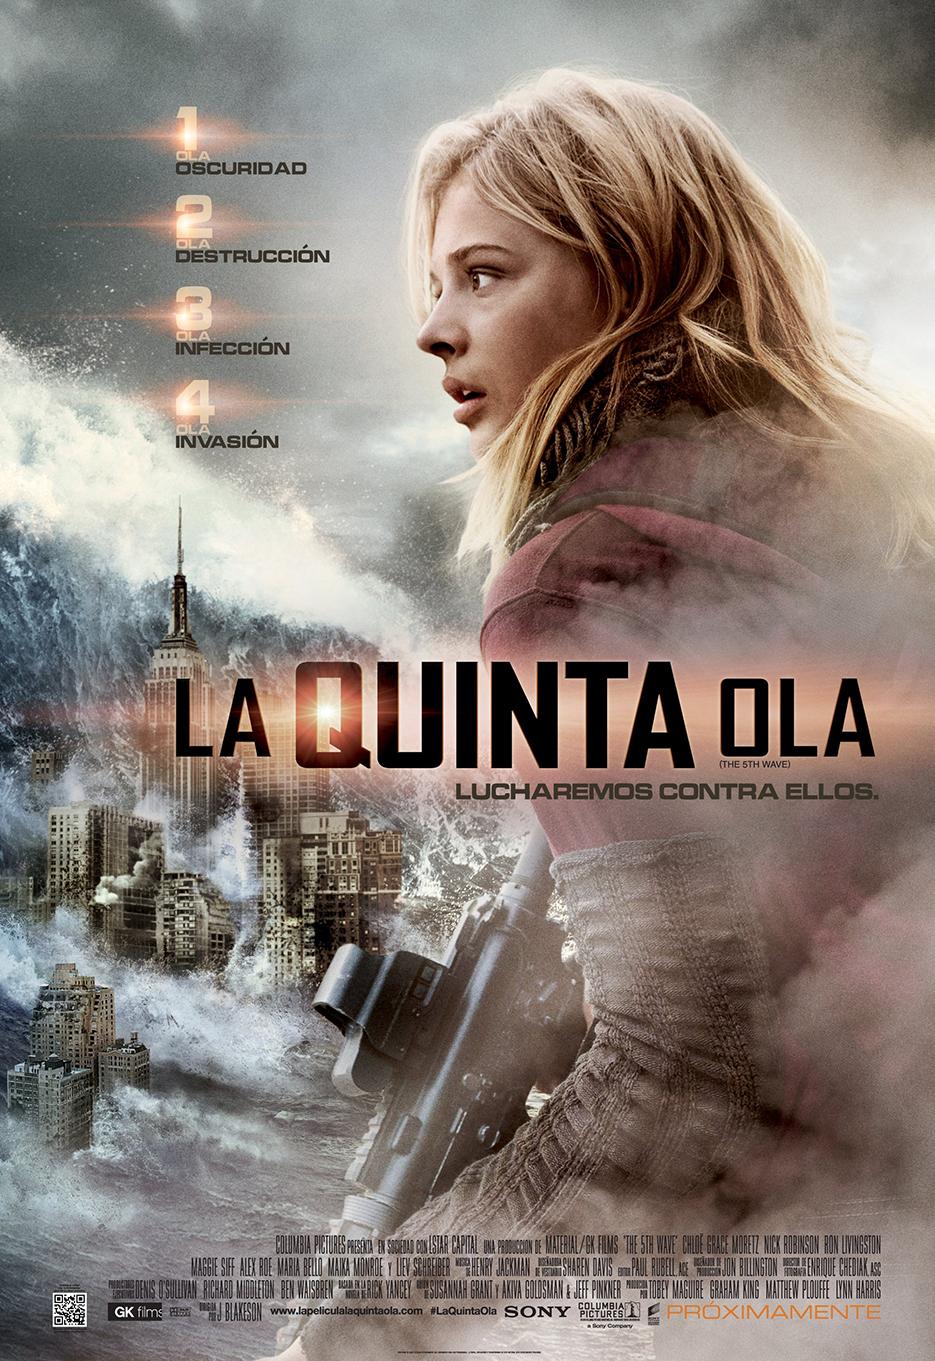 http://www.andesfilms.com.pe/la-quinta-ola-2016/